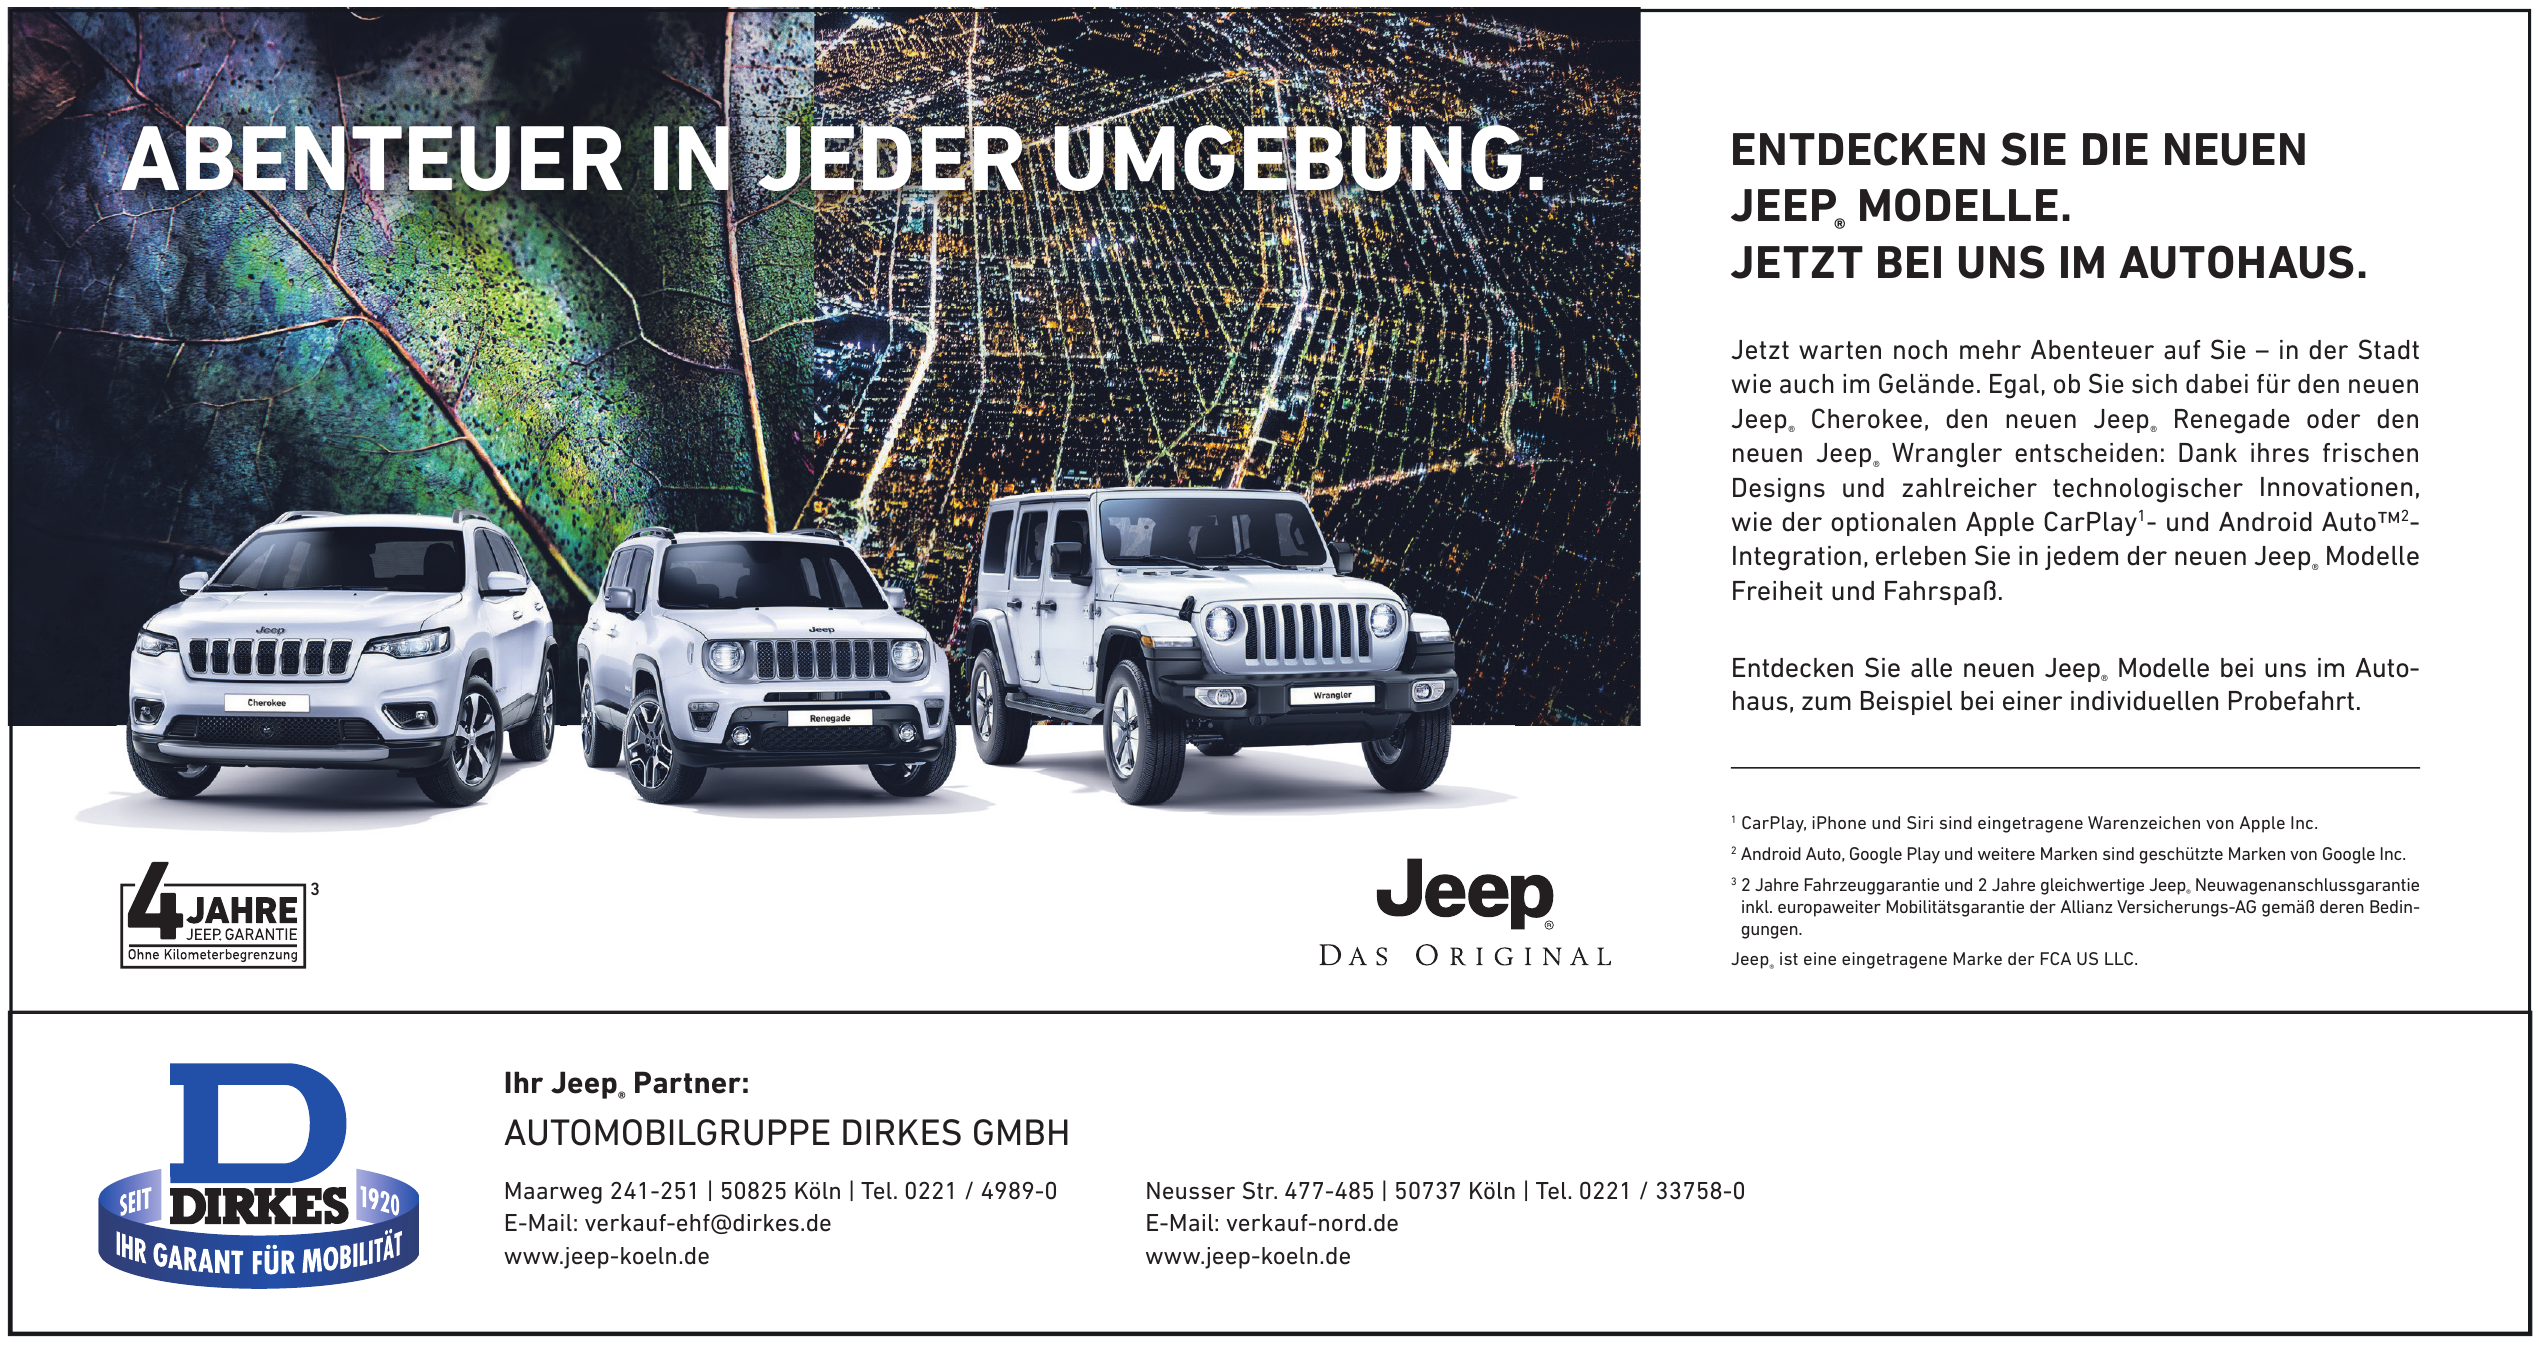 Automobilgruppe Dirkes GmbH